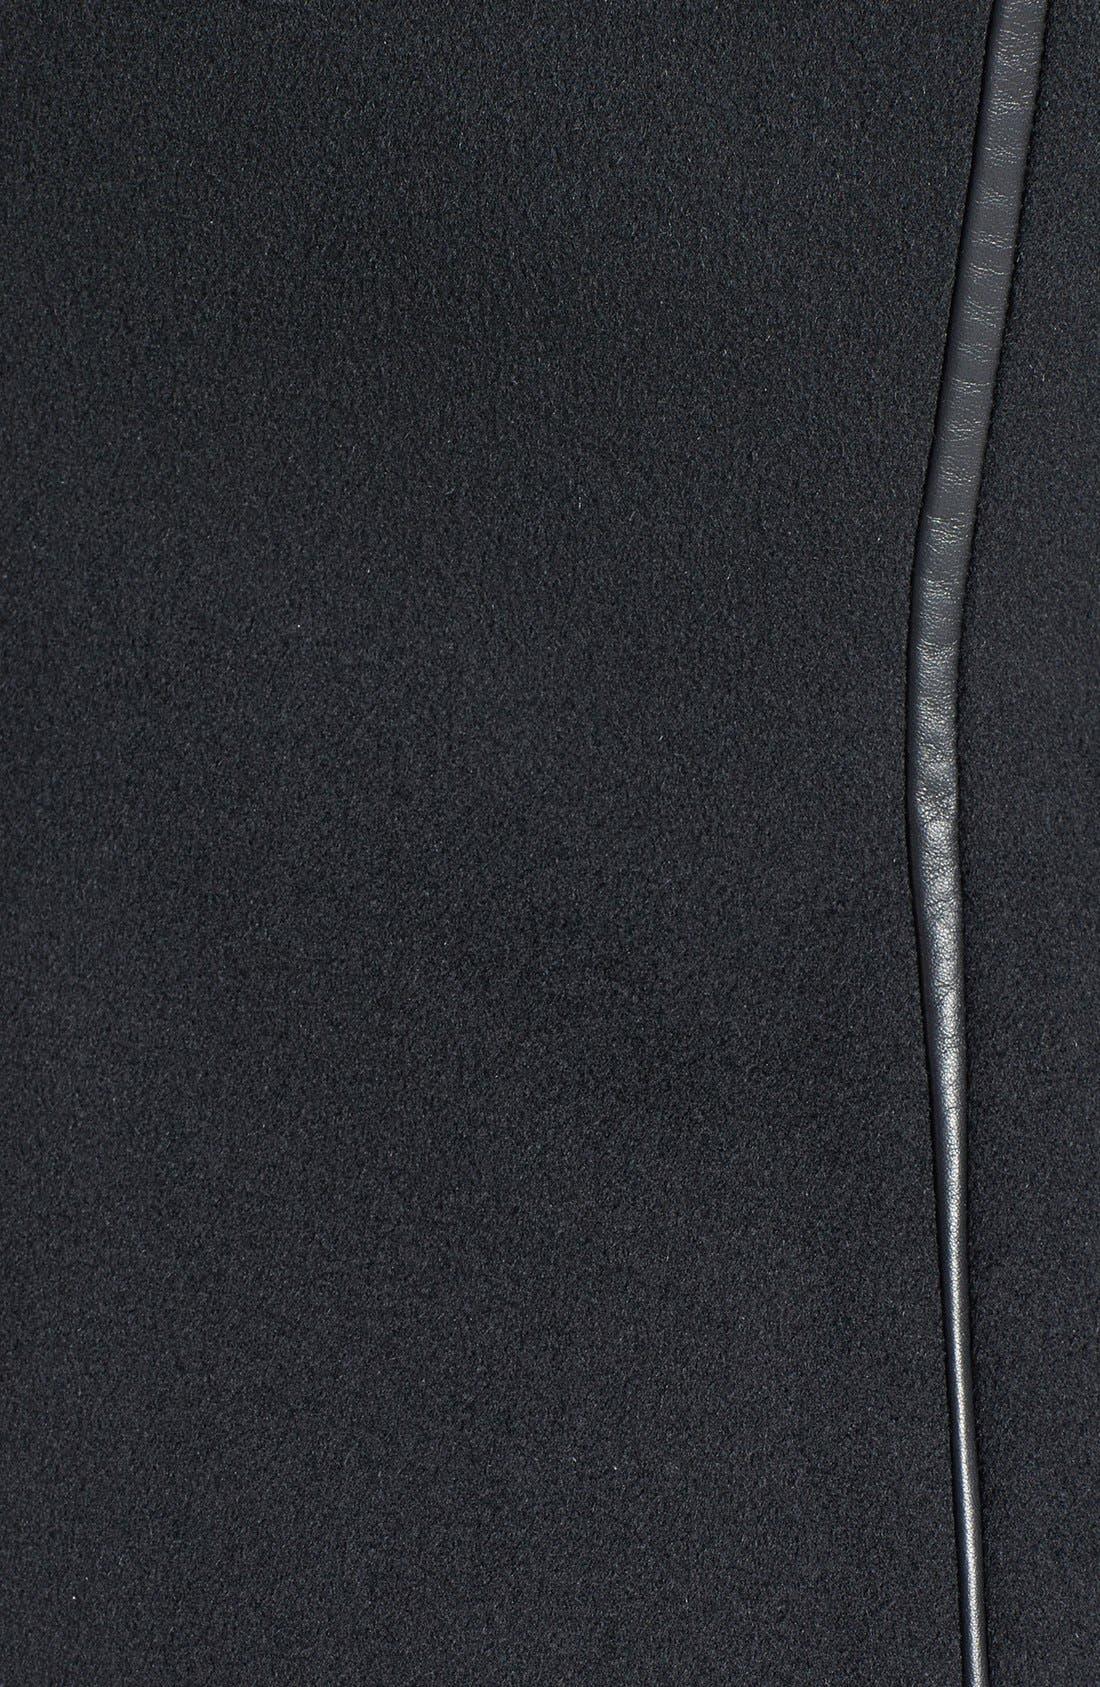 Alternate Image 3  - Dawn Levy 'Serena' Leather Sleeve Asymmetrical Wool Coat